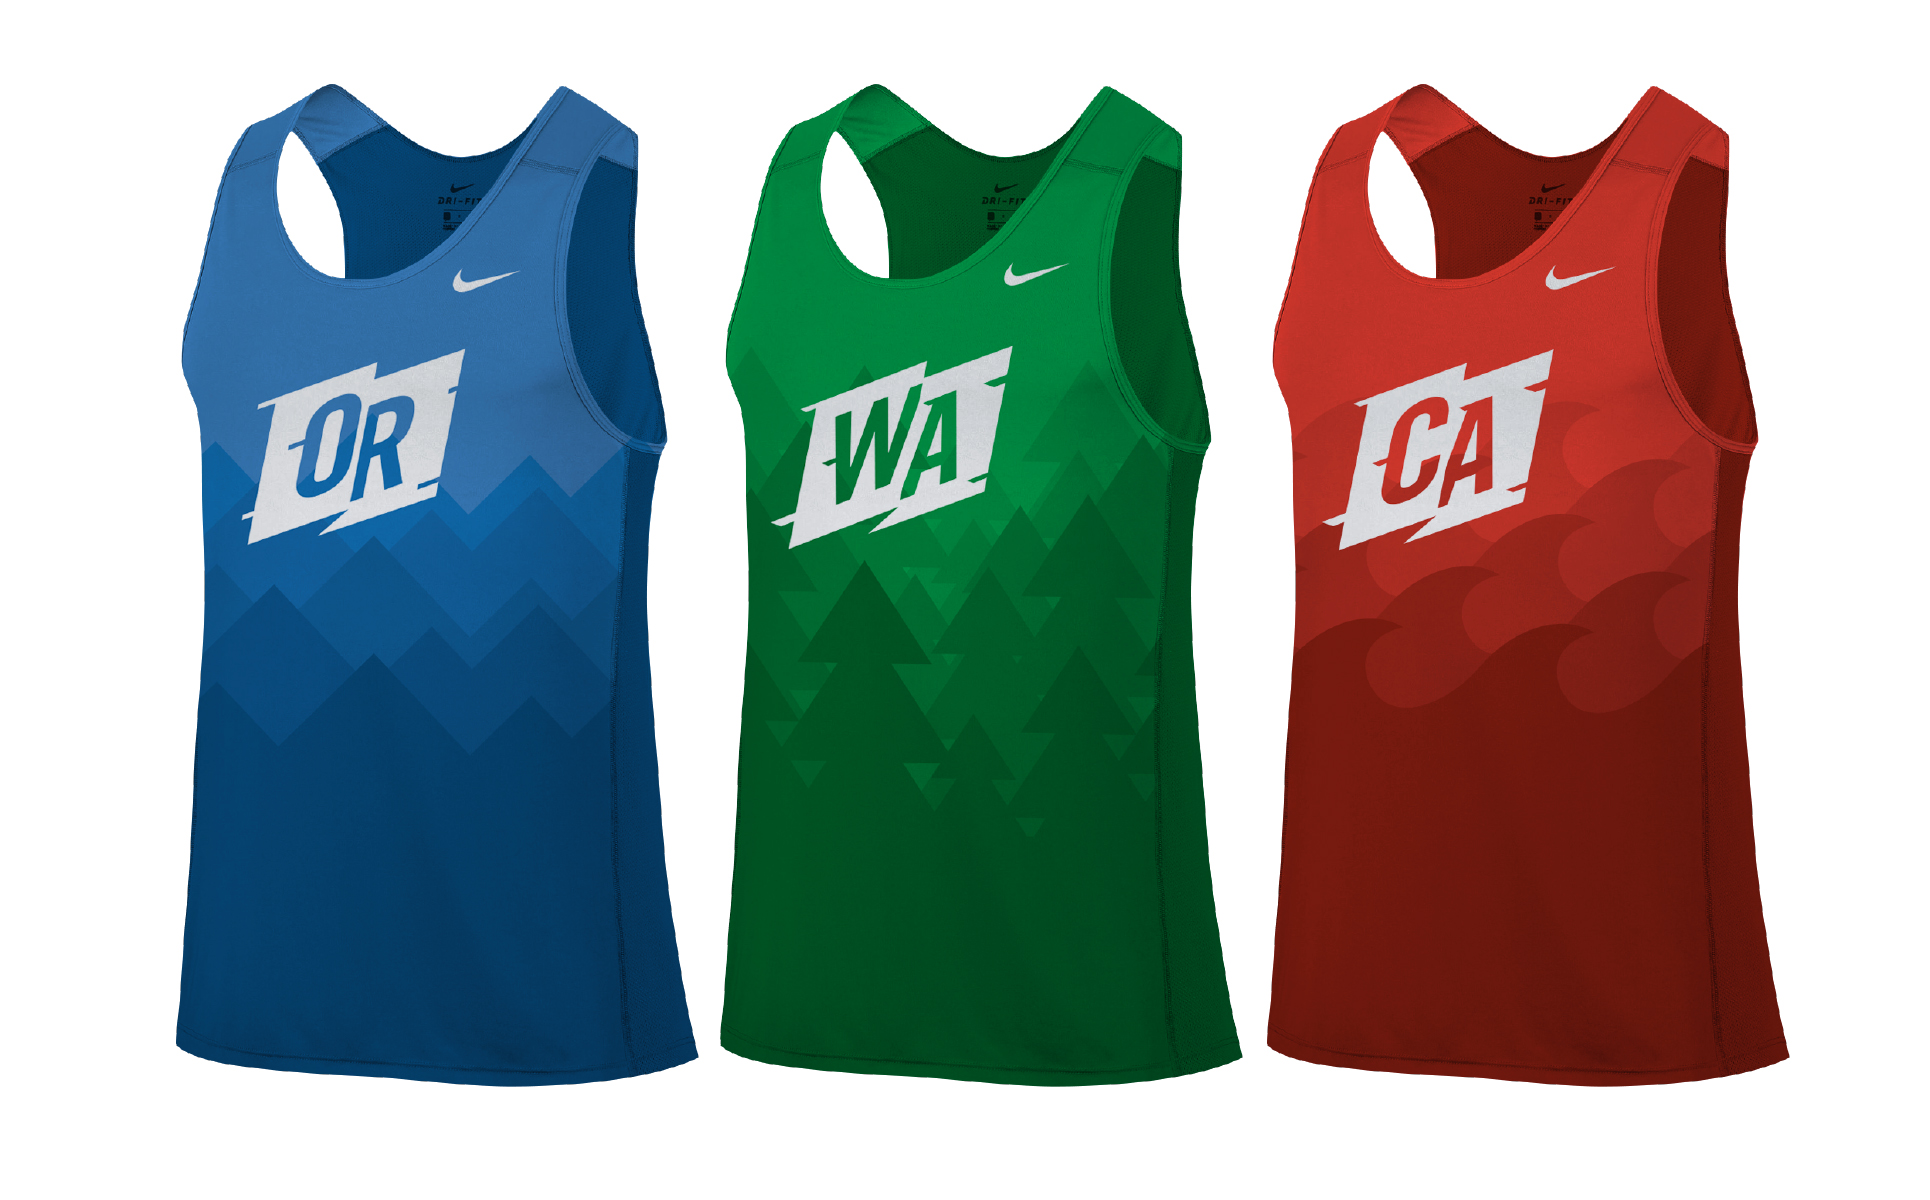 28888aee8 Uniform design for the BorderClash high school cross country running event.